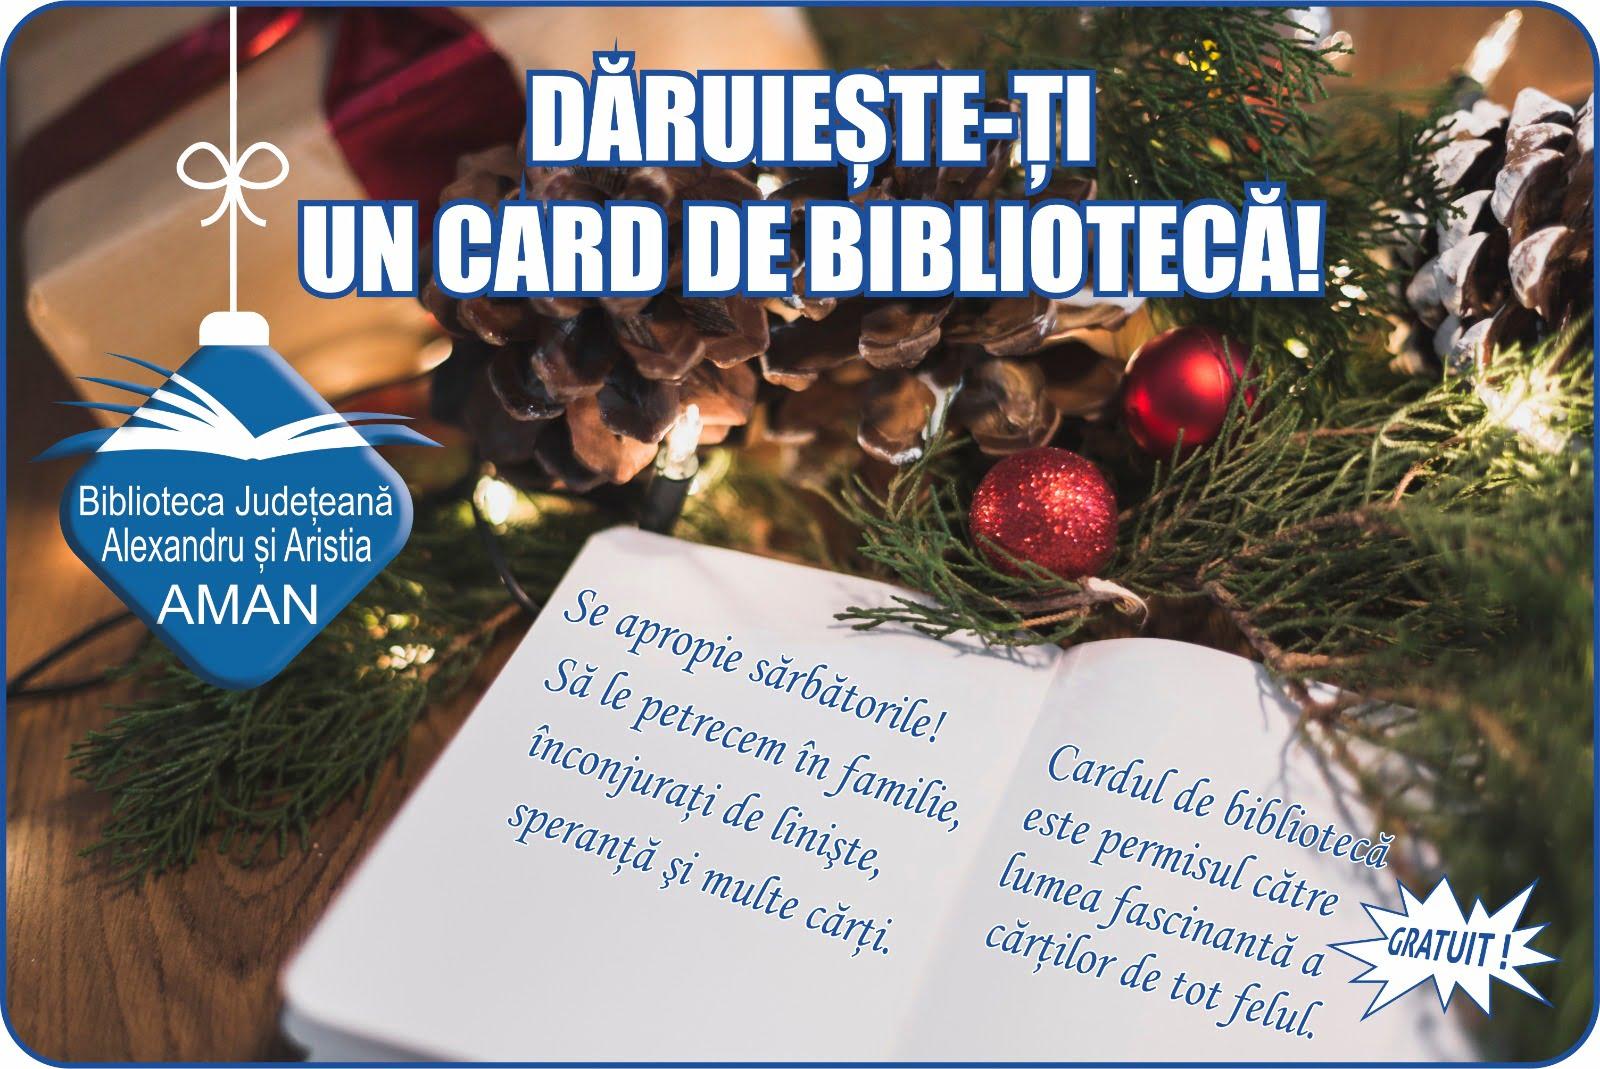 Card de biblioteca!